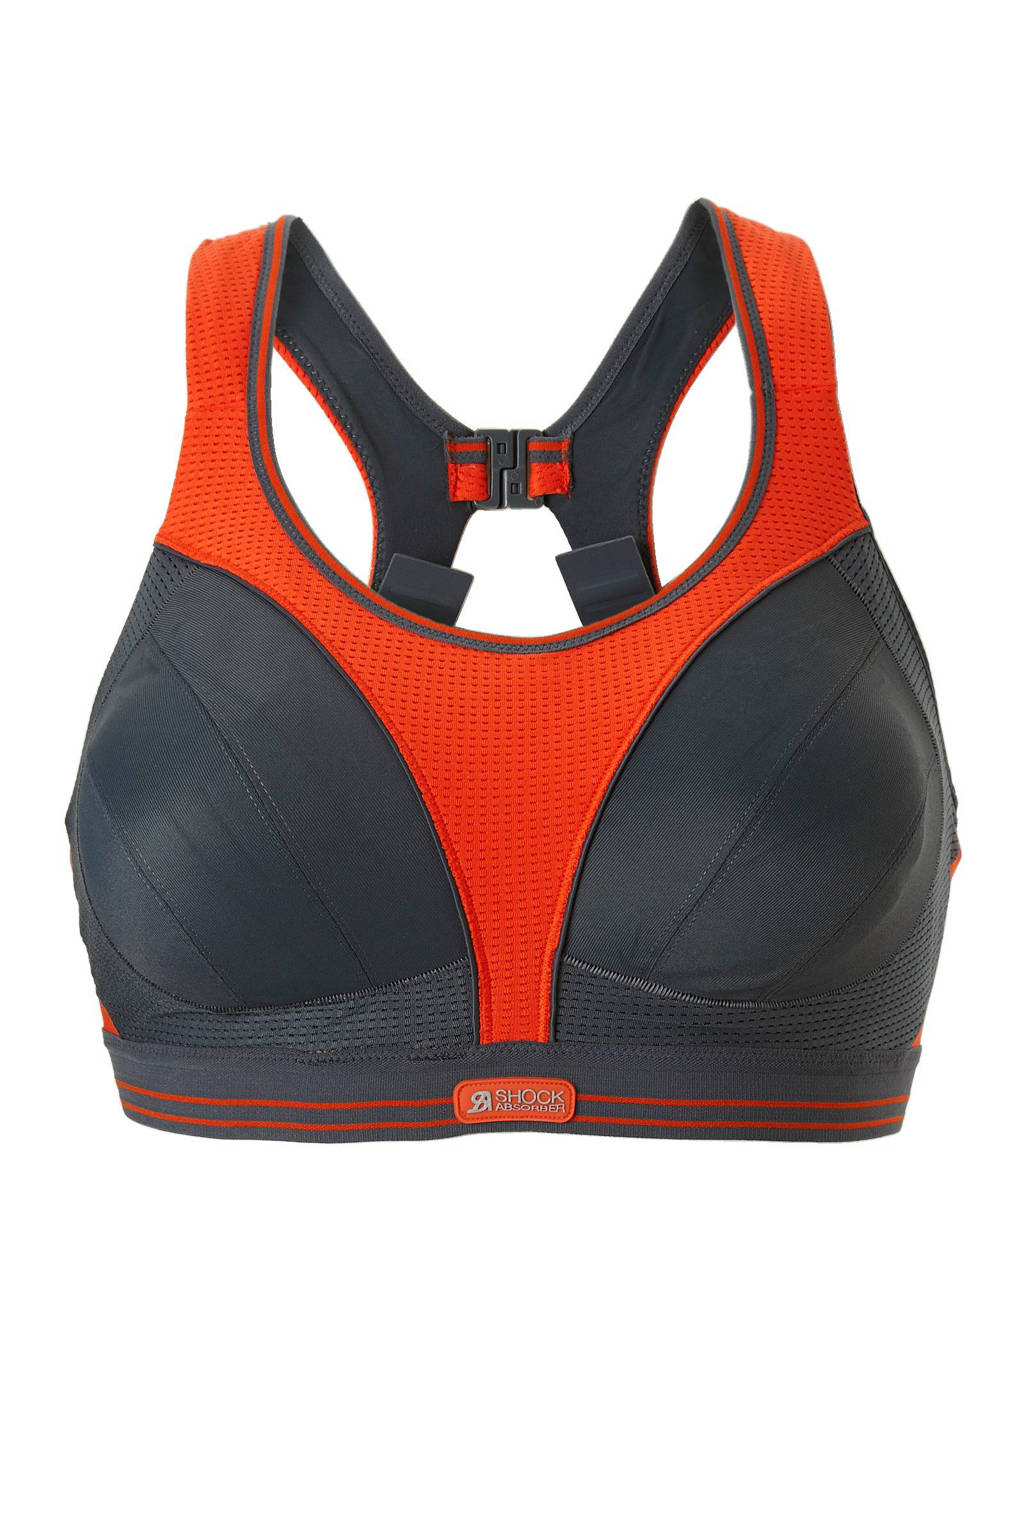 Shock Absorber sportbh Ultimate Run Bra grijs/oranje, Grijs/oranje